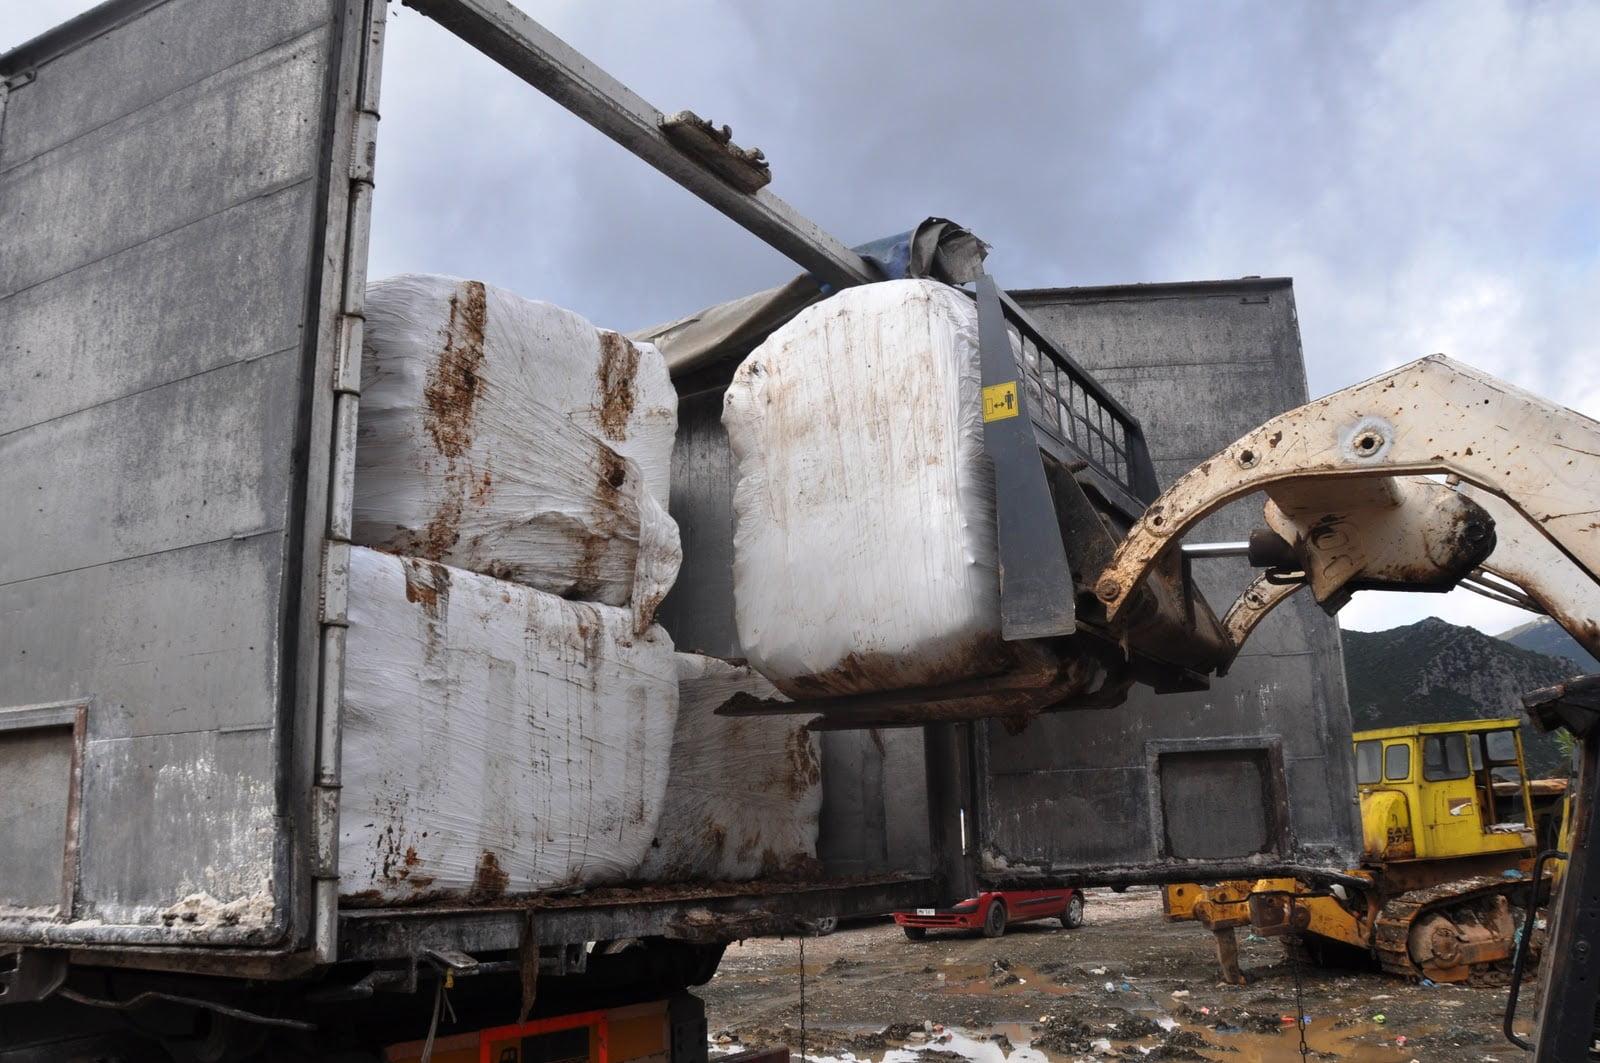 Photo of Ξεκίνησε η μεταφορά σκουπιδιων – δεμάτων και τα εναποθετει ο εργολάβος στο Χυτα Λευκίμμης